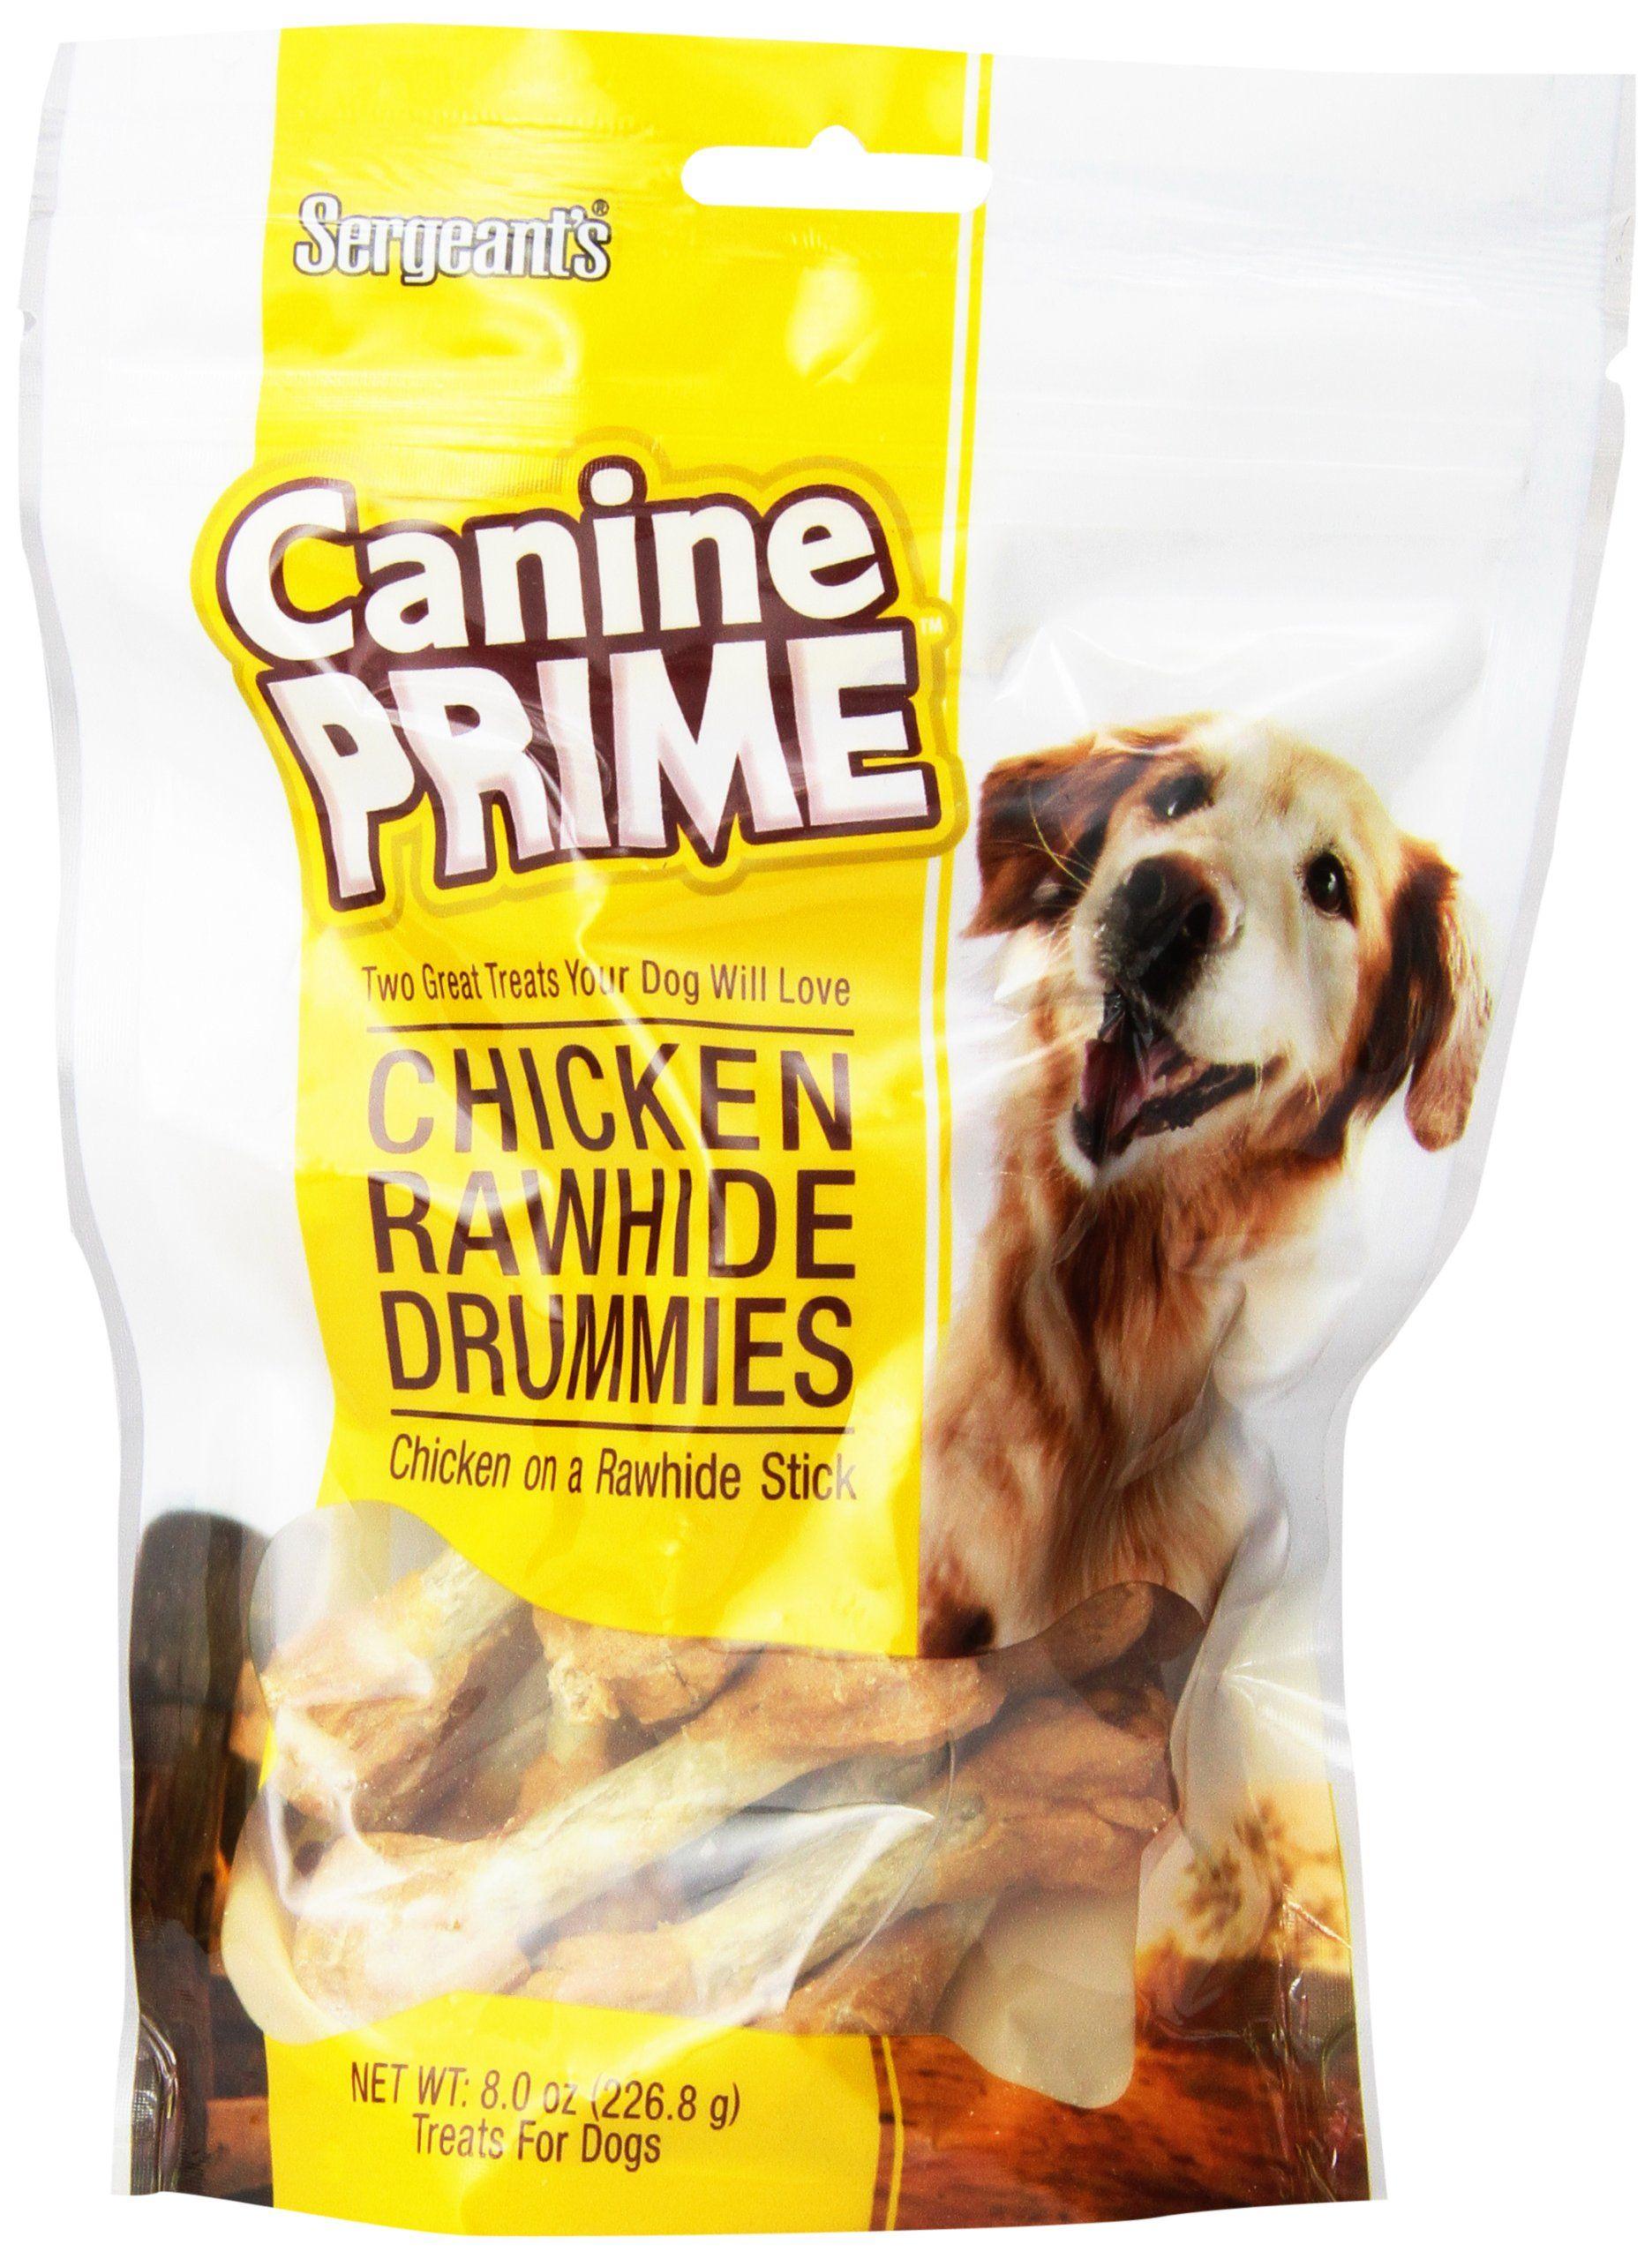 Sergeants Canine Prime Chicken Drummies Pet Food ** Click